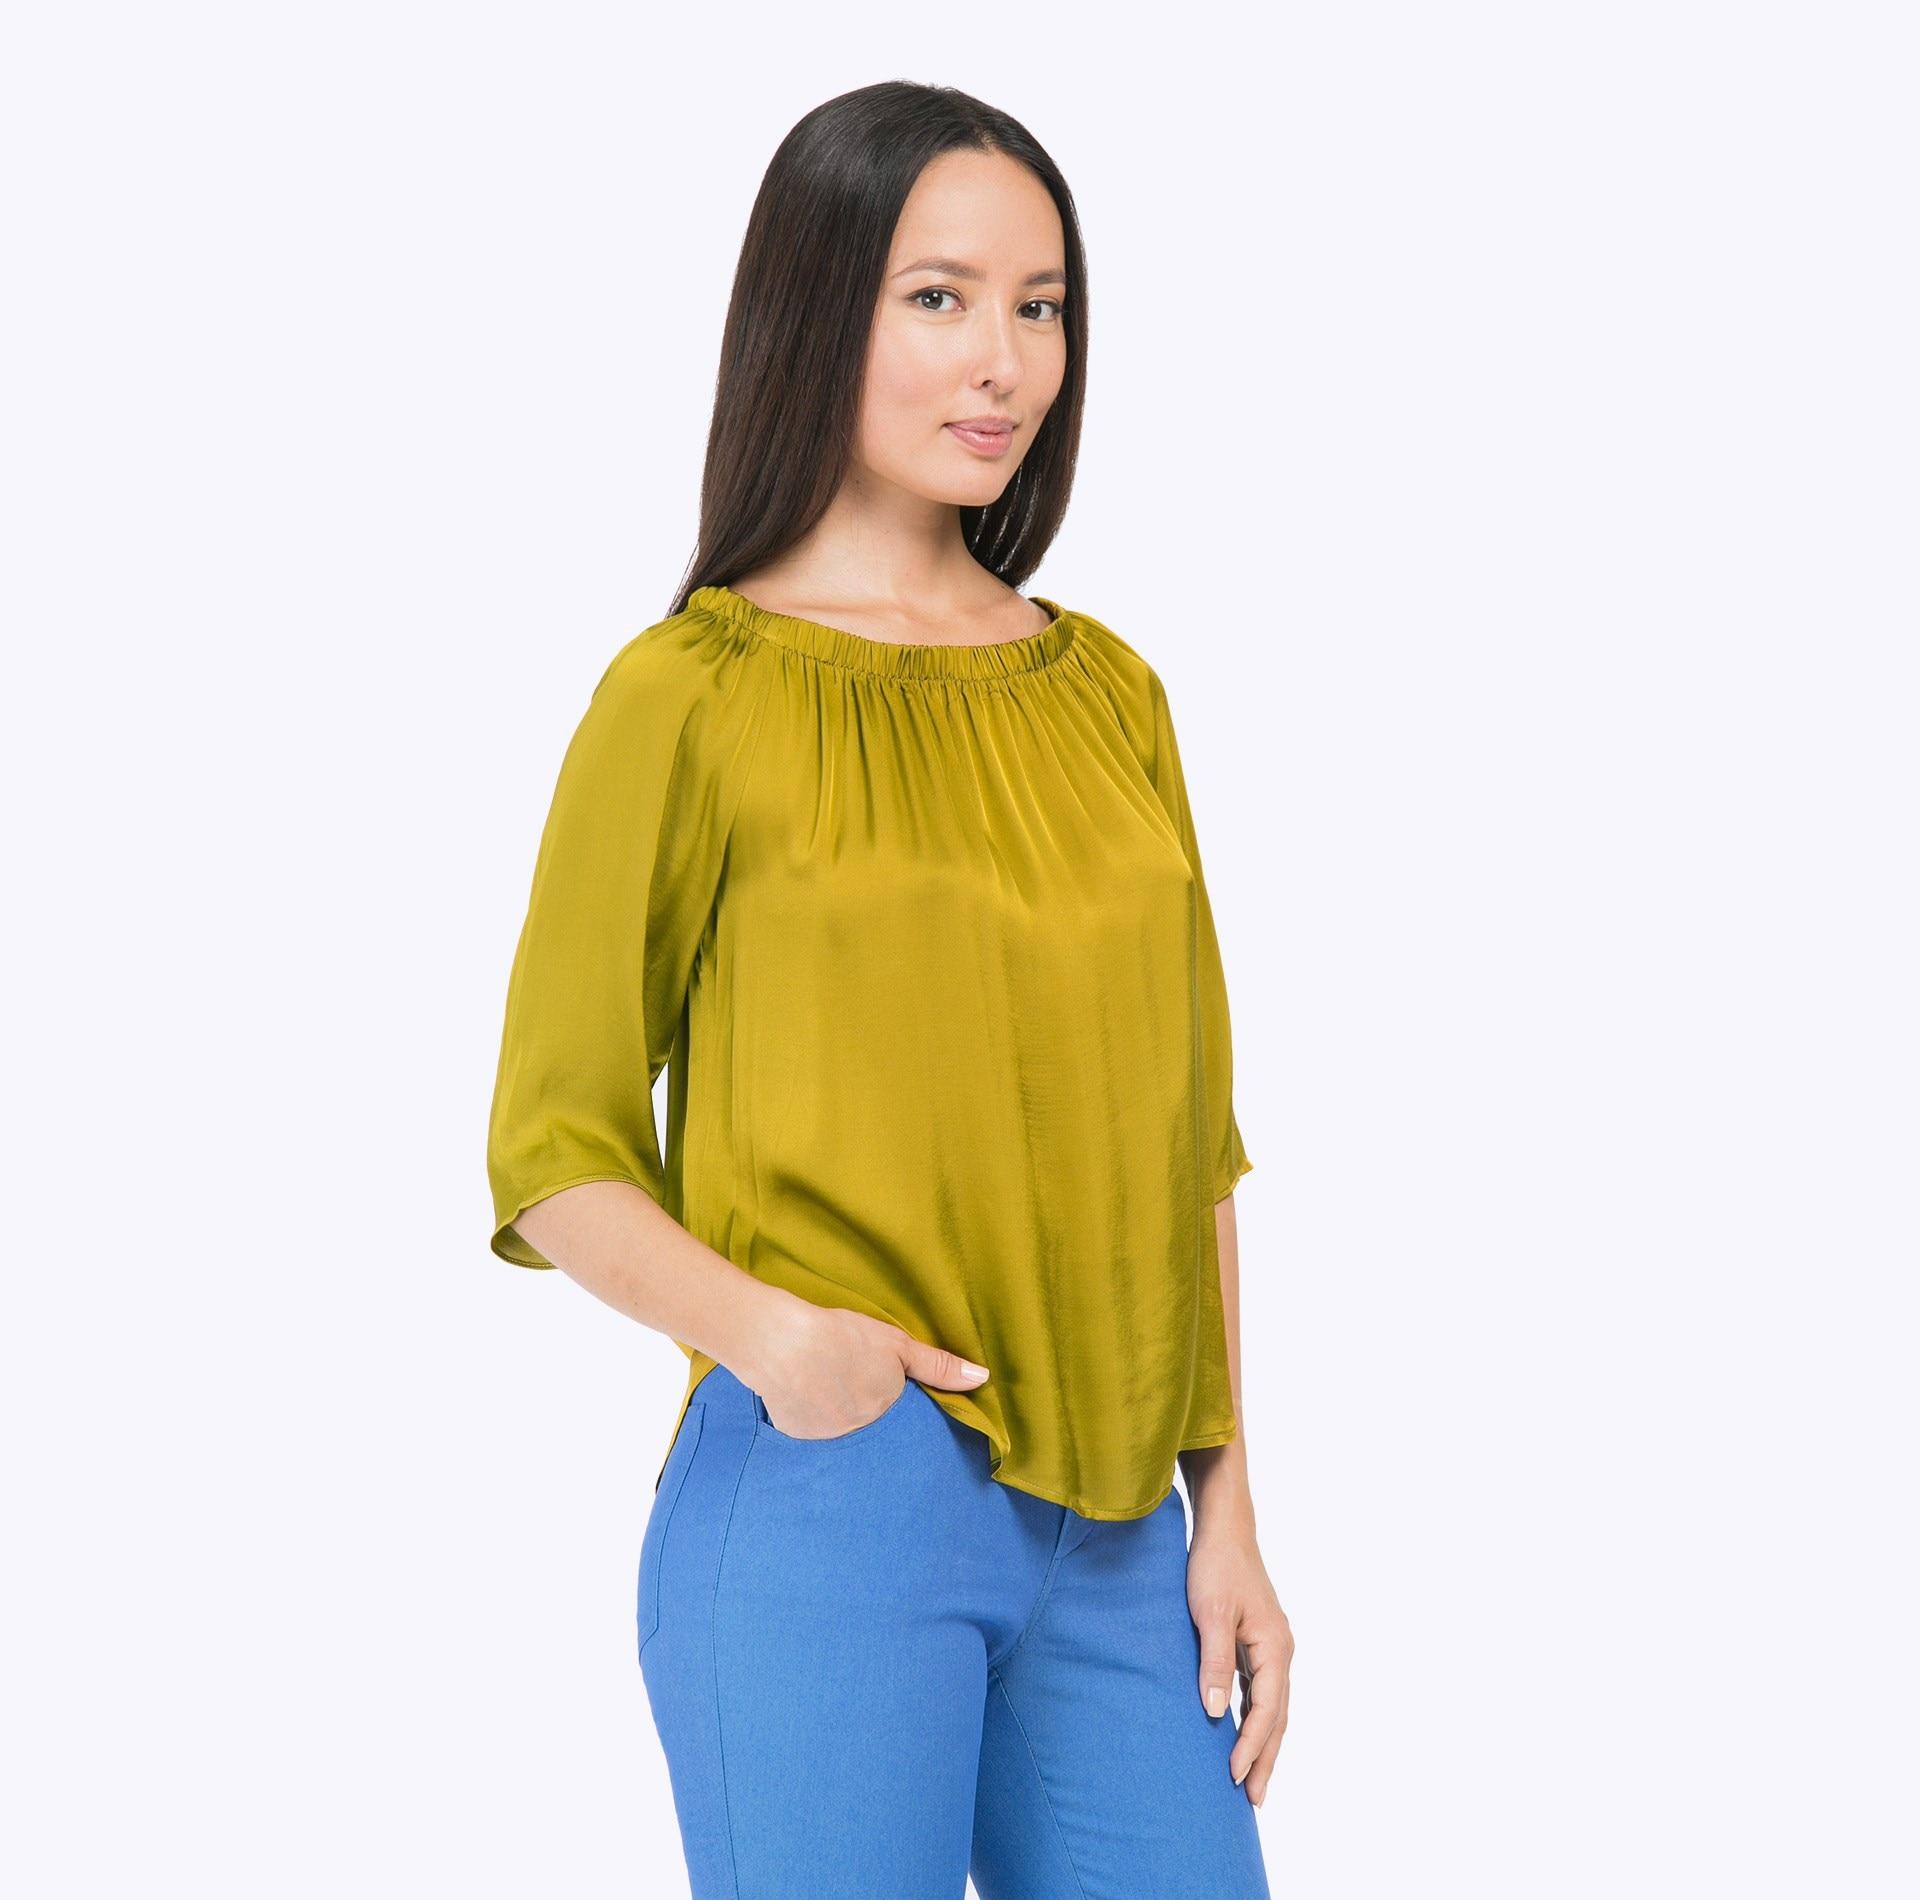 Blouse B2269/gala ruffle trim blouse